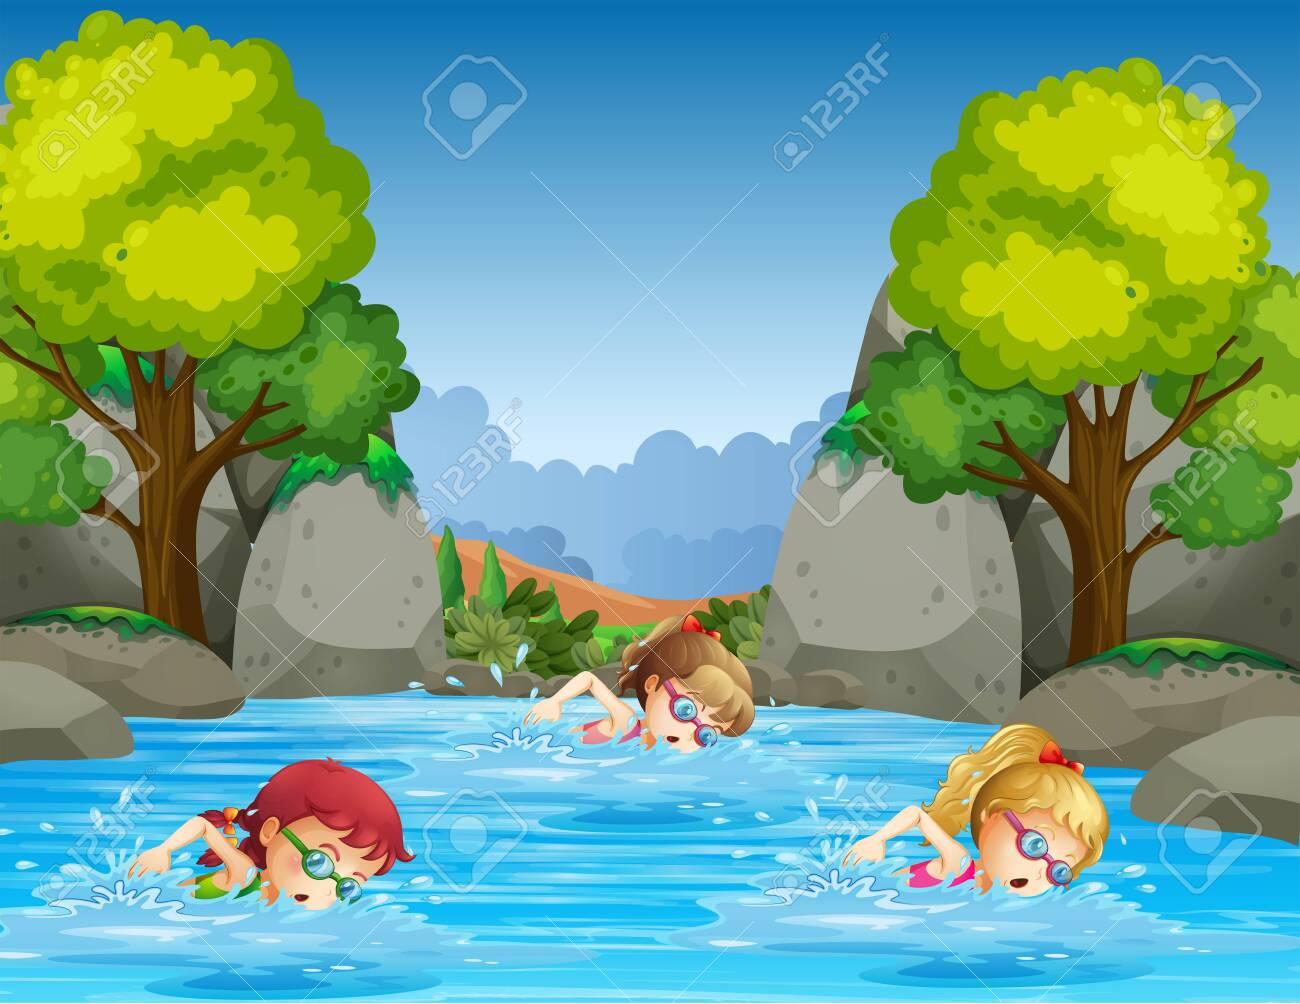 Children swimming in nature illustration - 121487587